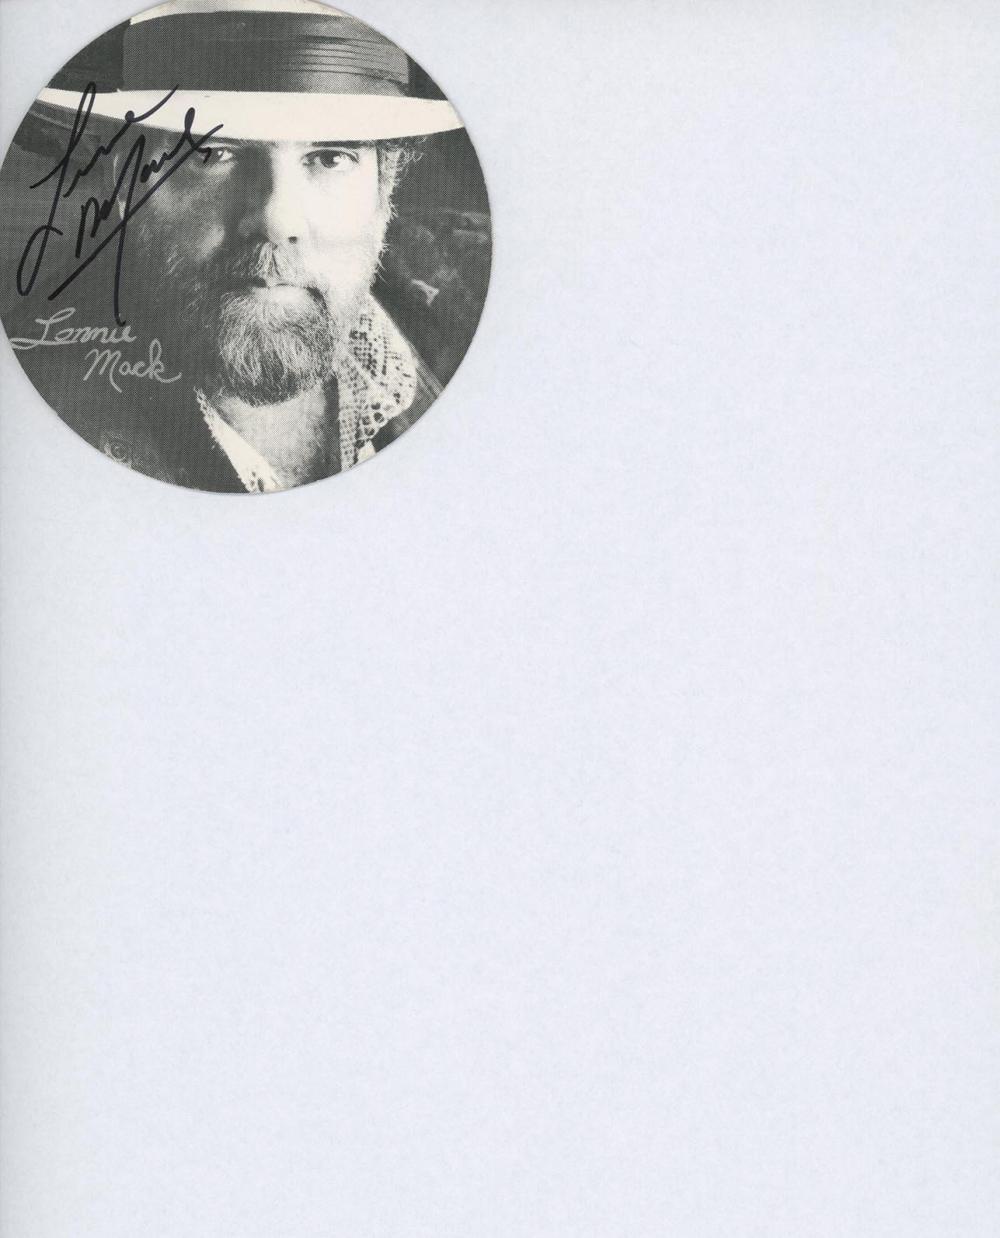 Lonnie Mack signed record sticker